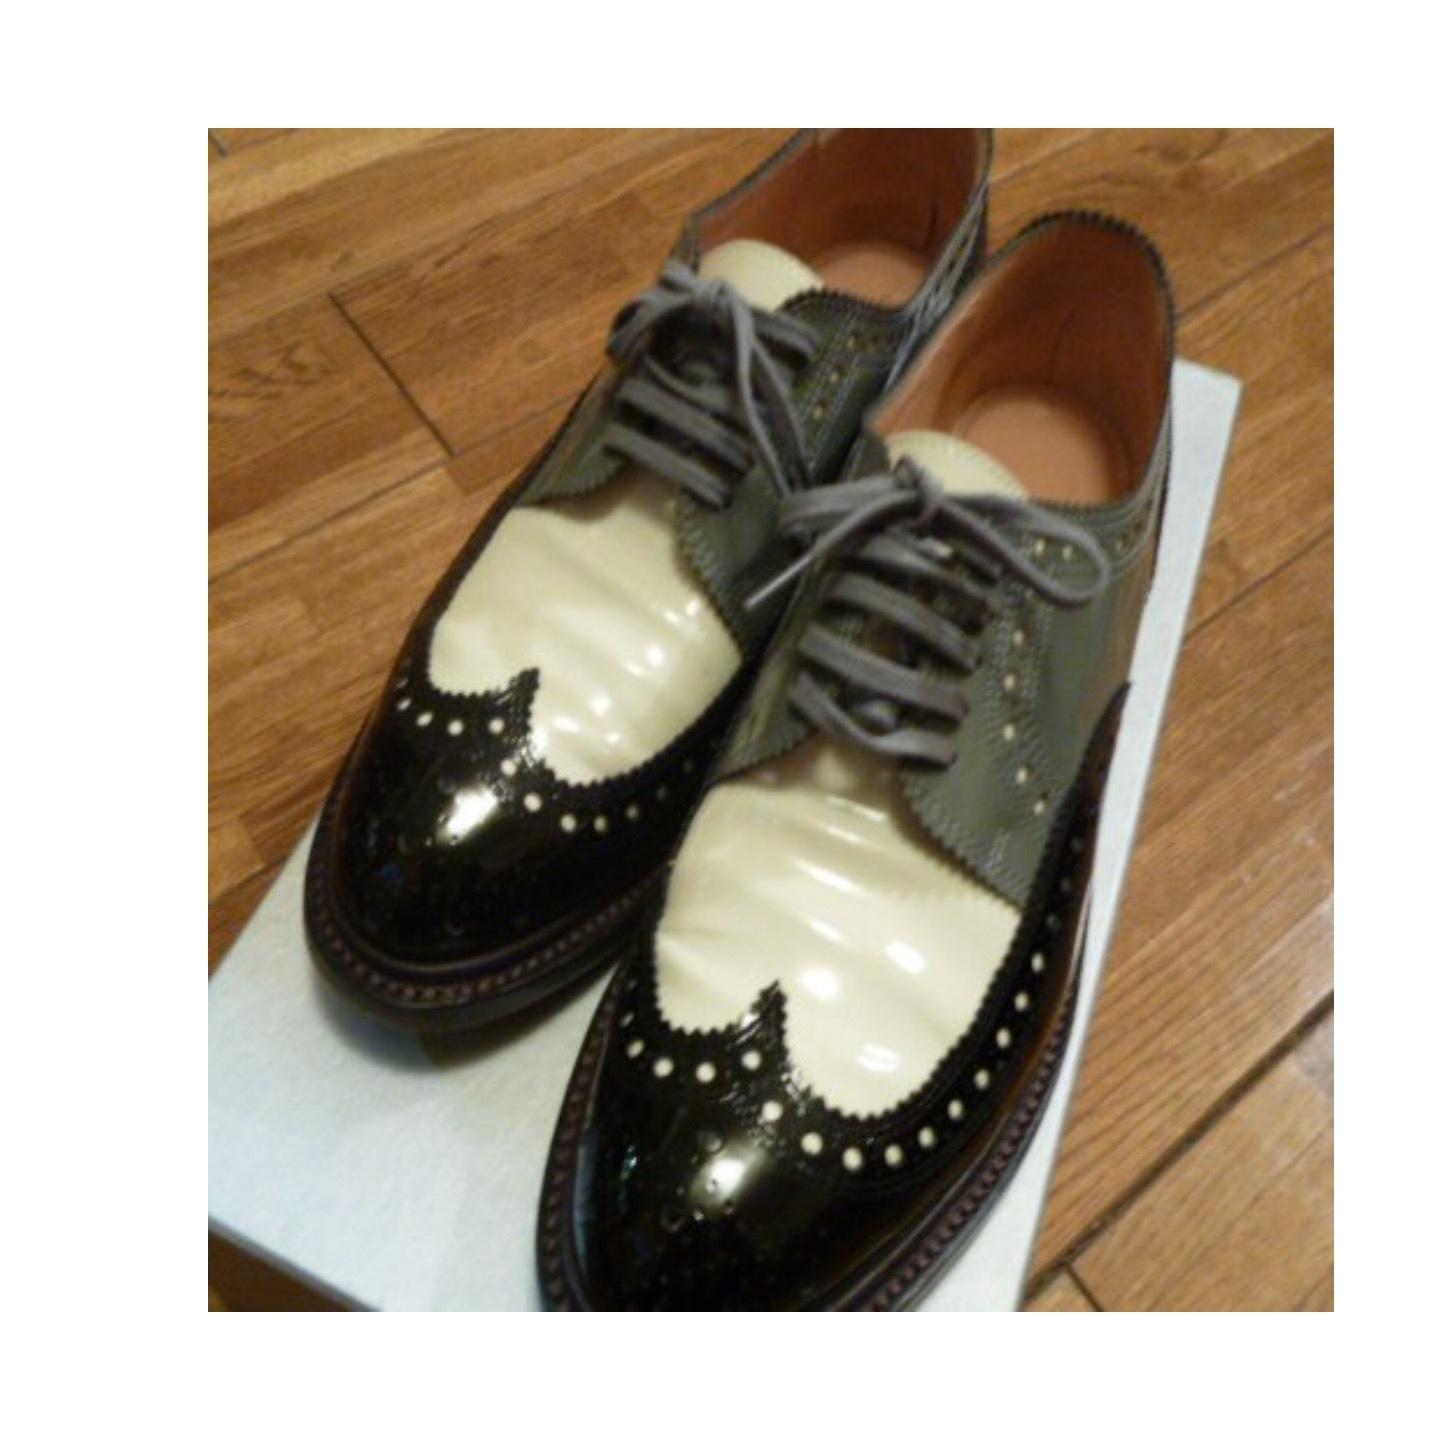 madameHの靴の変遷…紐靴とローファー_b0210699_23250014.jpeg